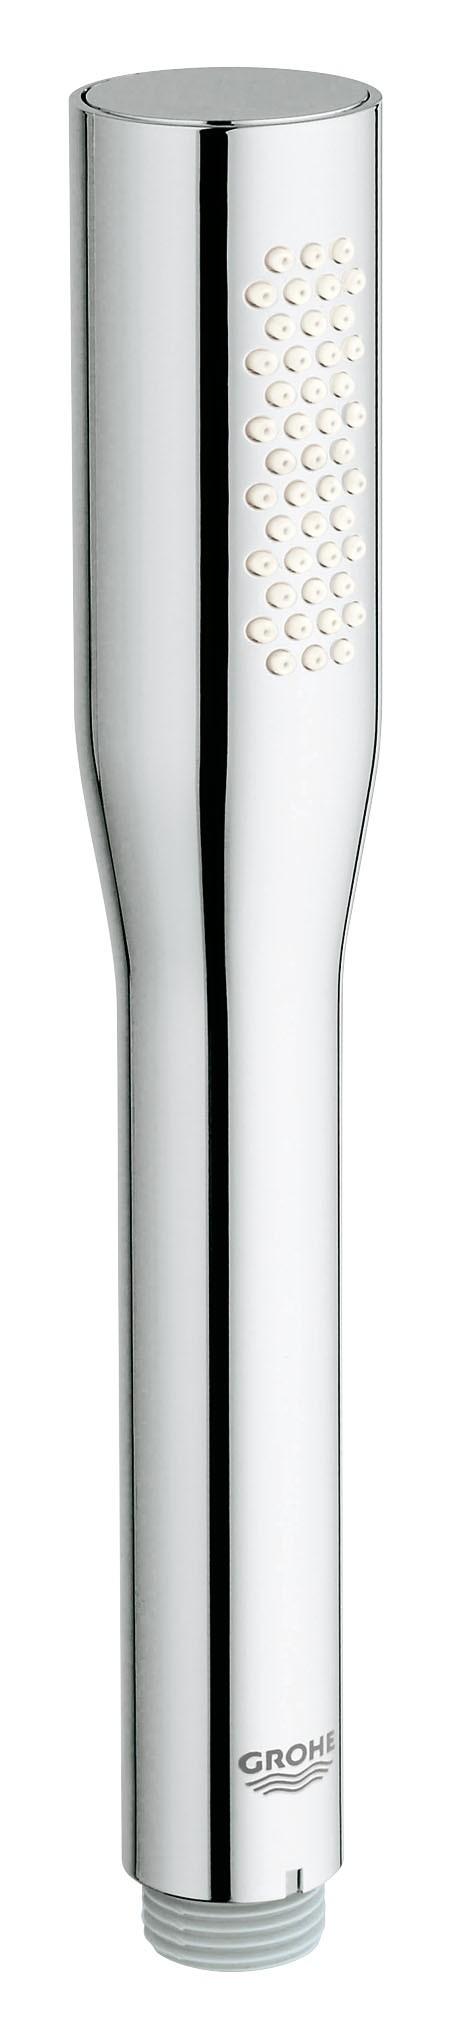 Grohe 27400000 Euphoria Cosmopolitan (1 режим) с ограничением расхода воды, хром